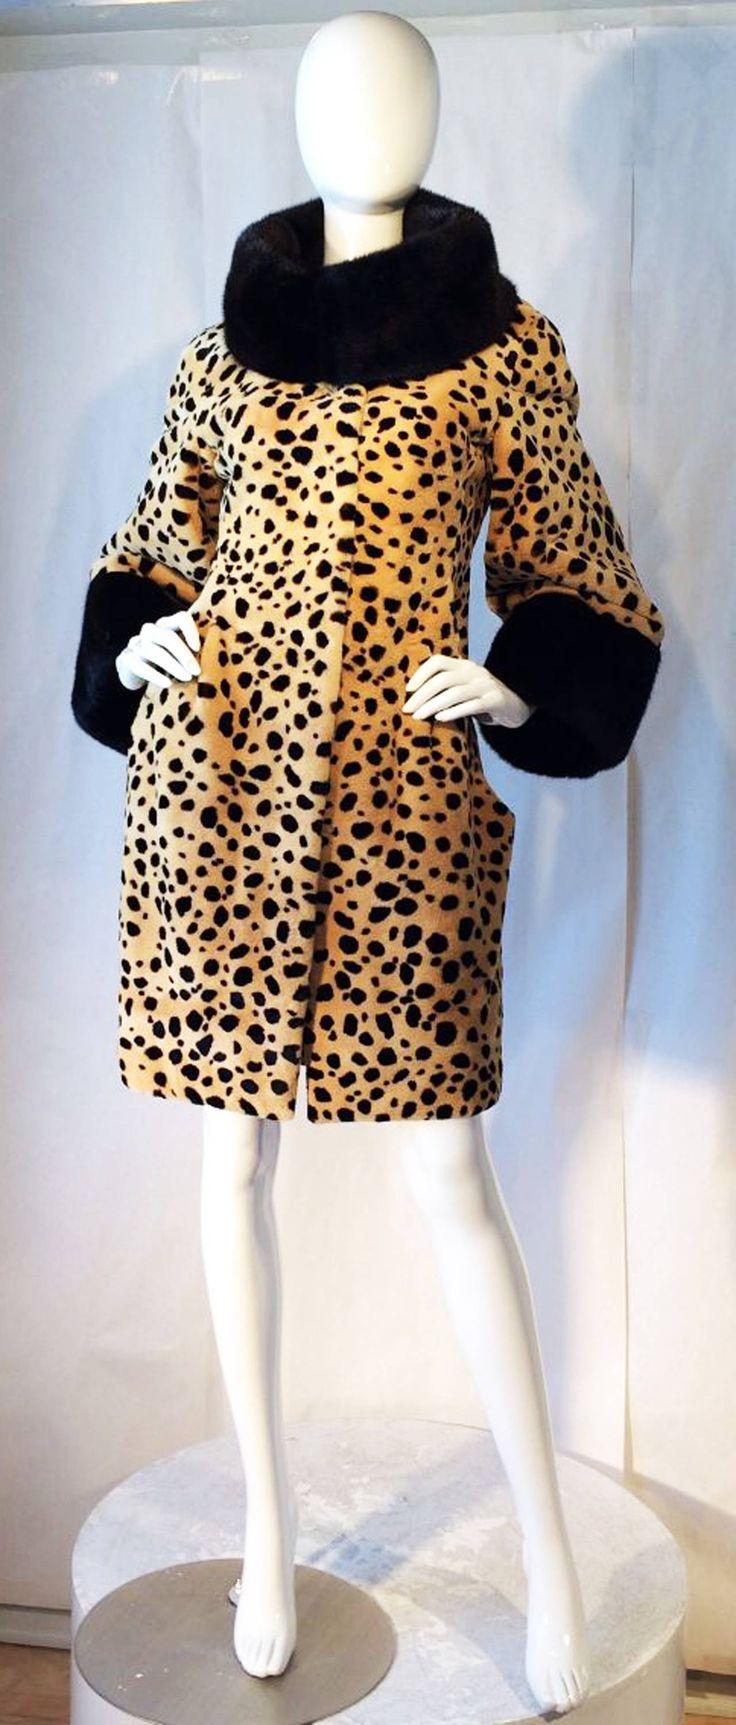 Catherine Malandrino Couture Sheared Mink Coat 2